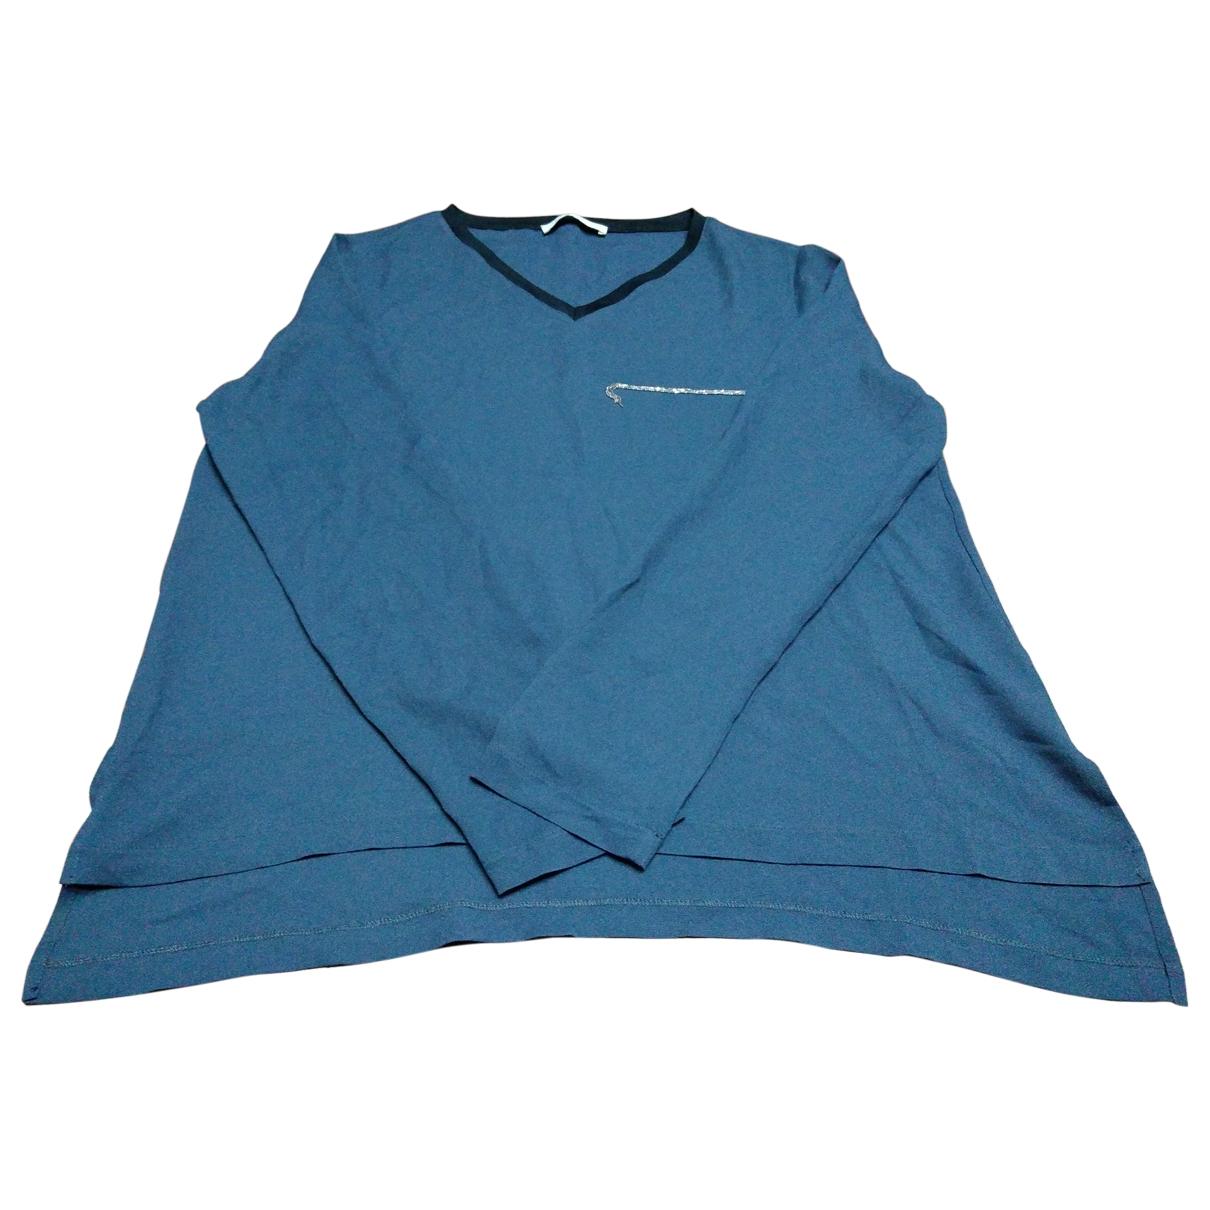 Fabiana Filippi \N Blue Silk dress for Women 42 IT